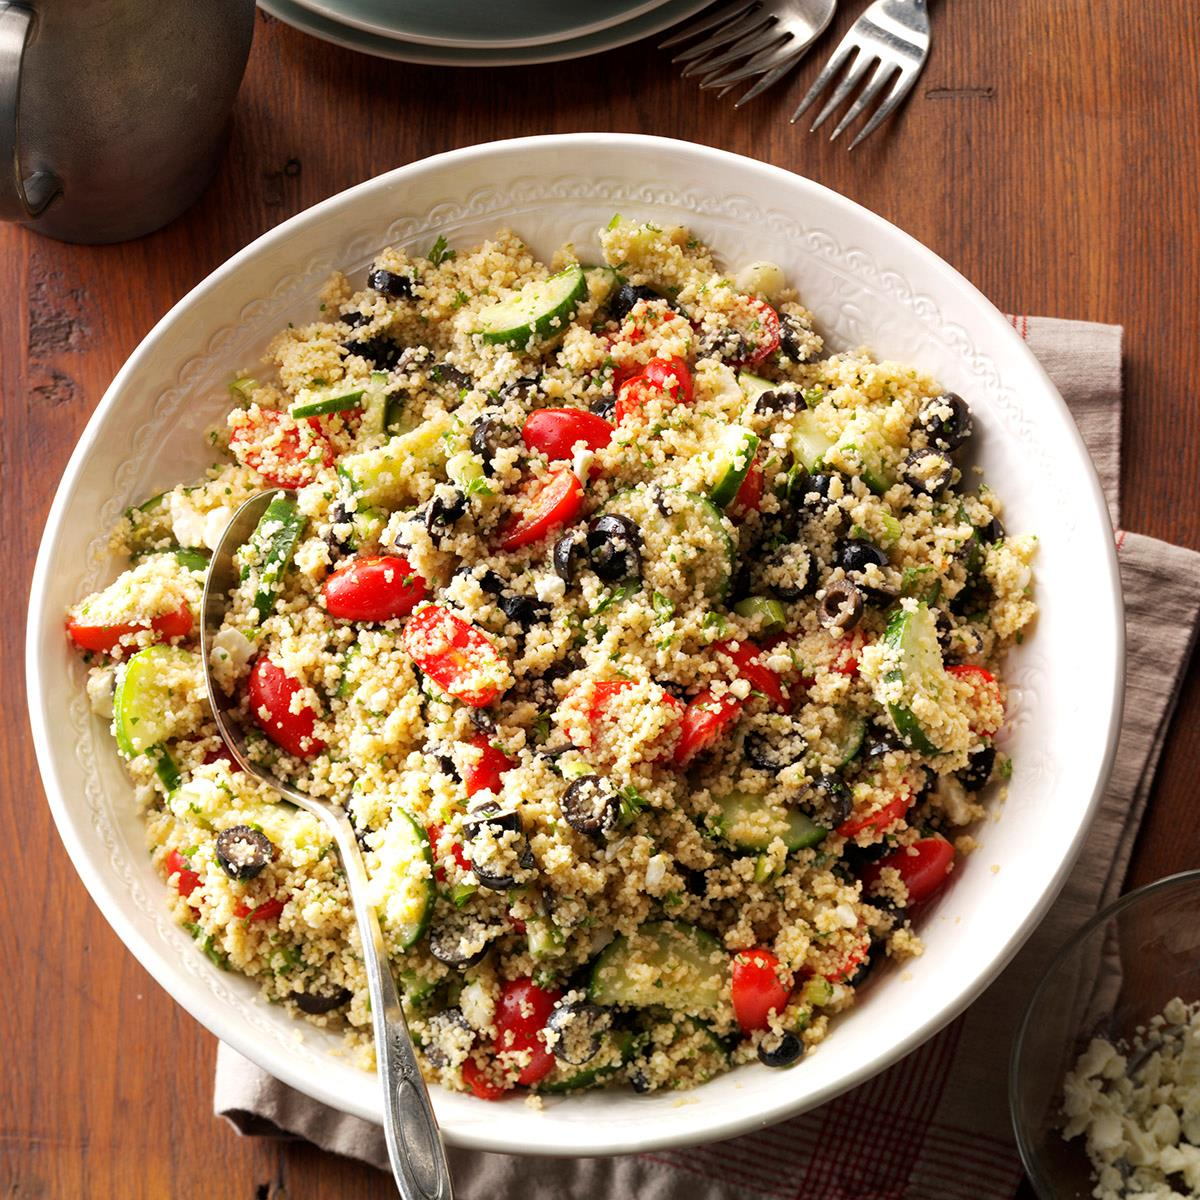 Coucous Salad Greek couscous salad recipe taste of home sisterspd